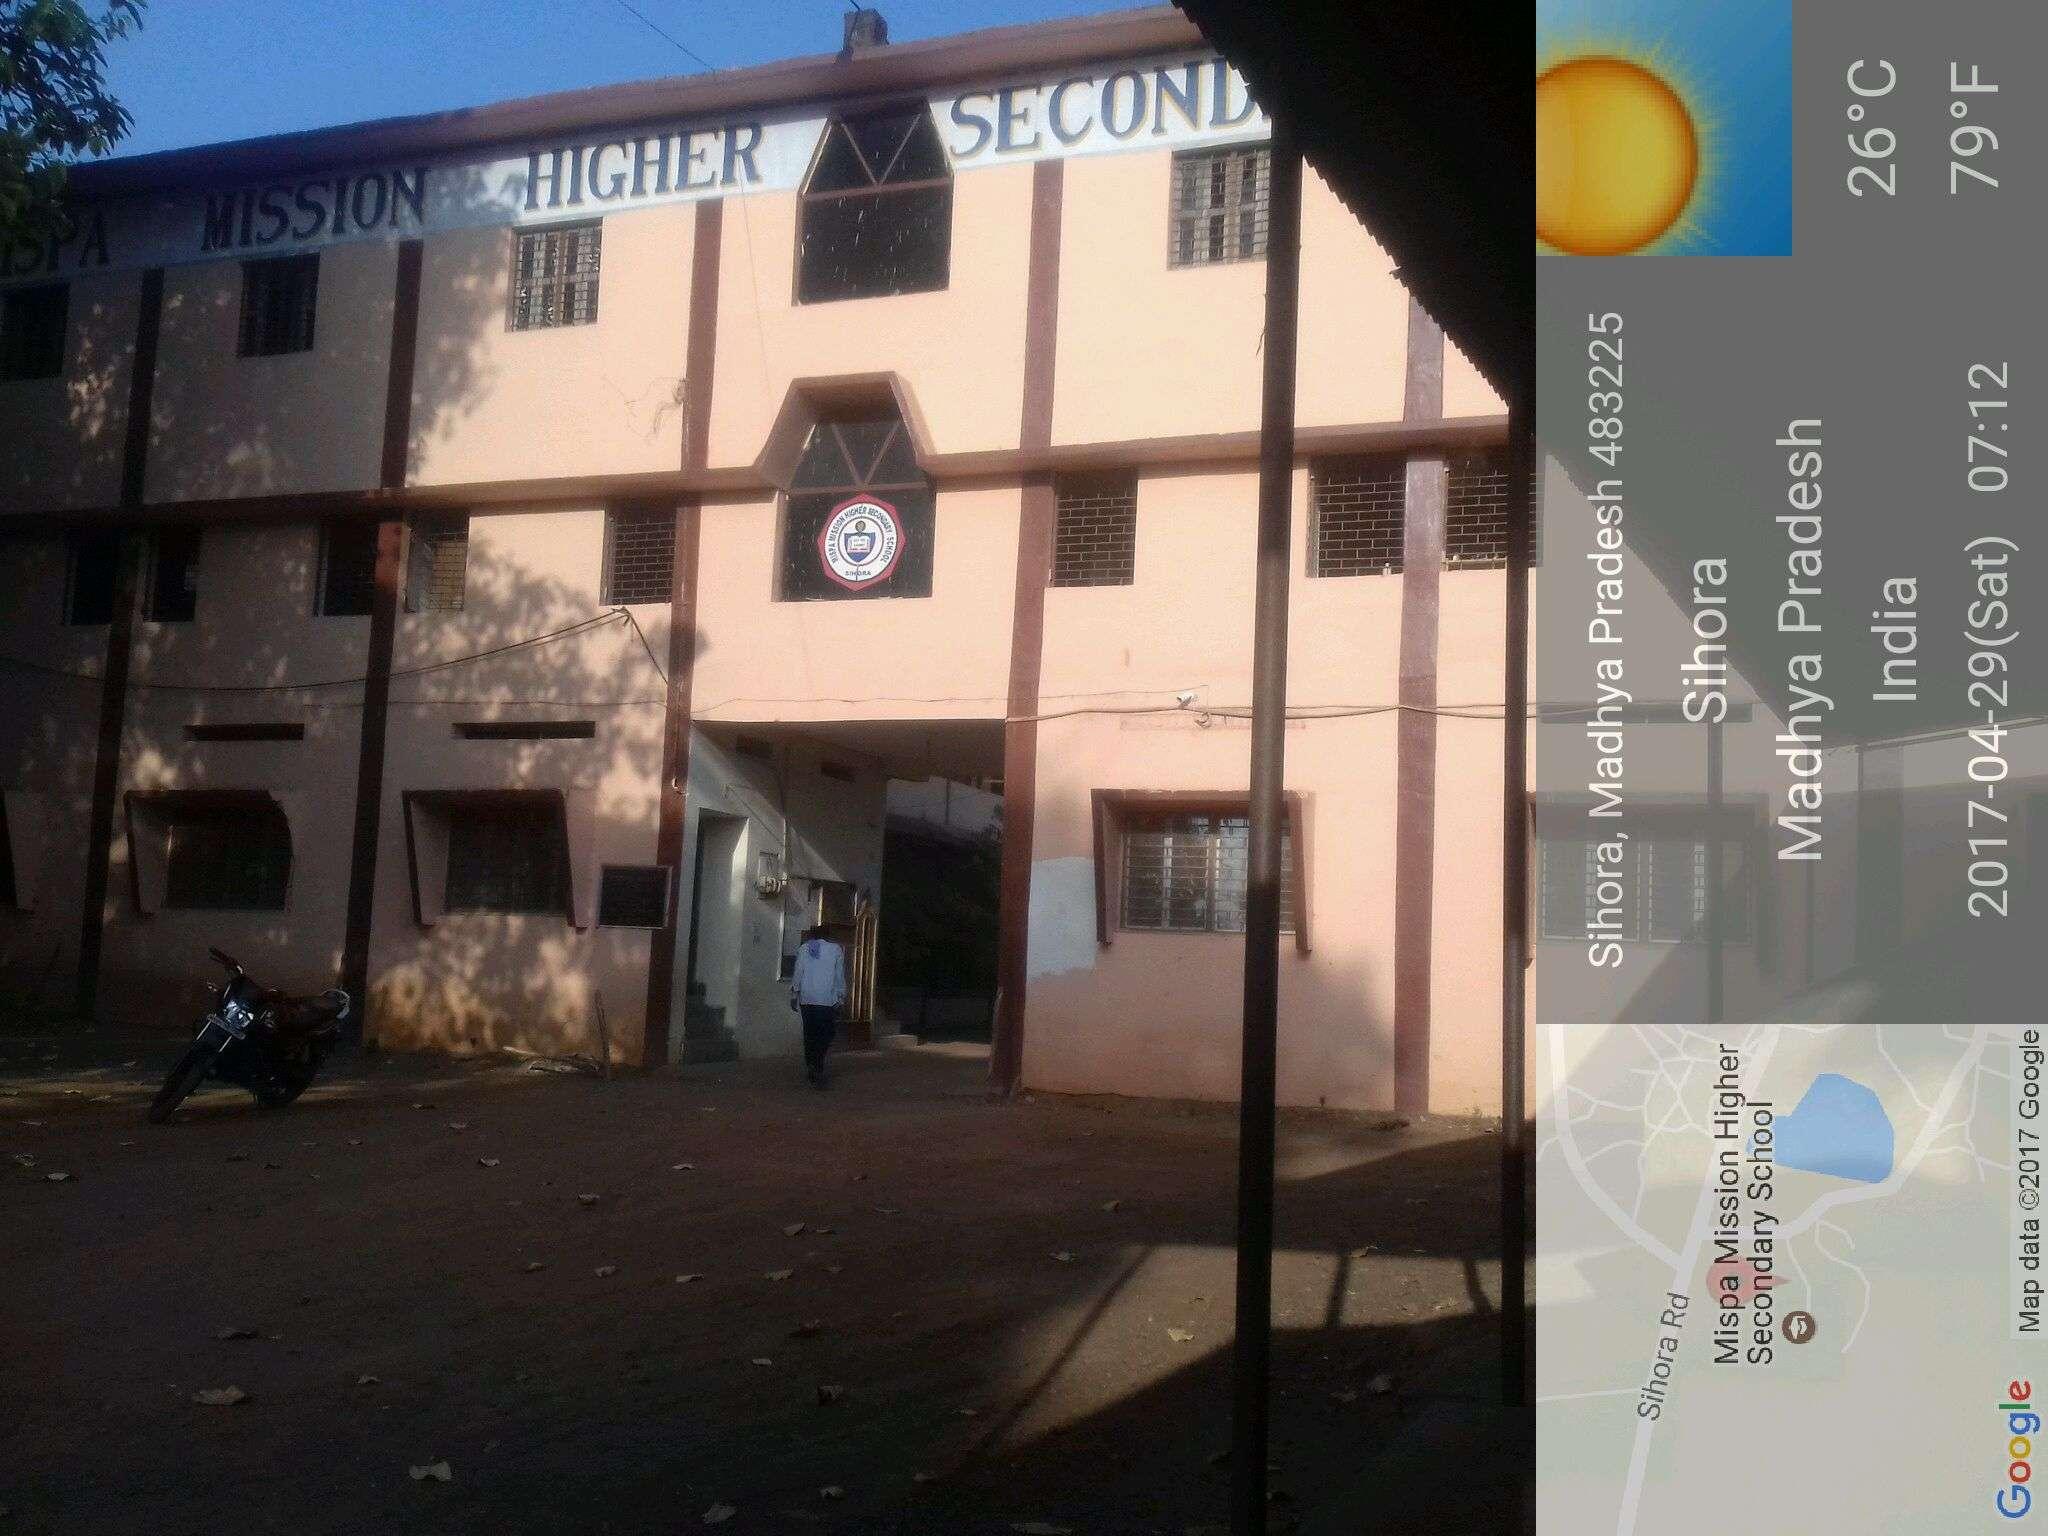 Mispa Mission Higher Secondary School Sihora Ward no 8 Sihora Dist Jabalpur M P 483 225 1030520